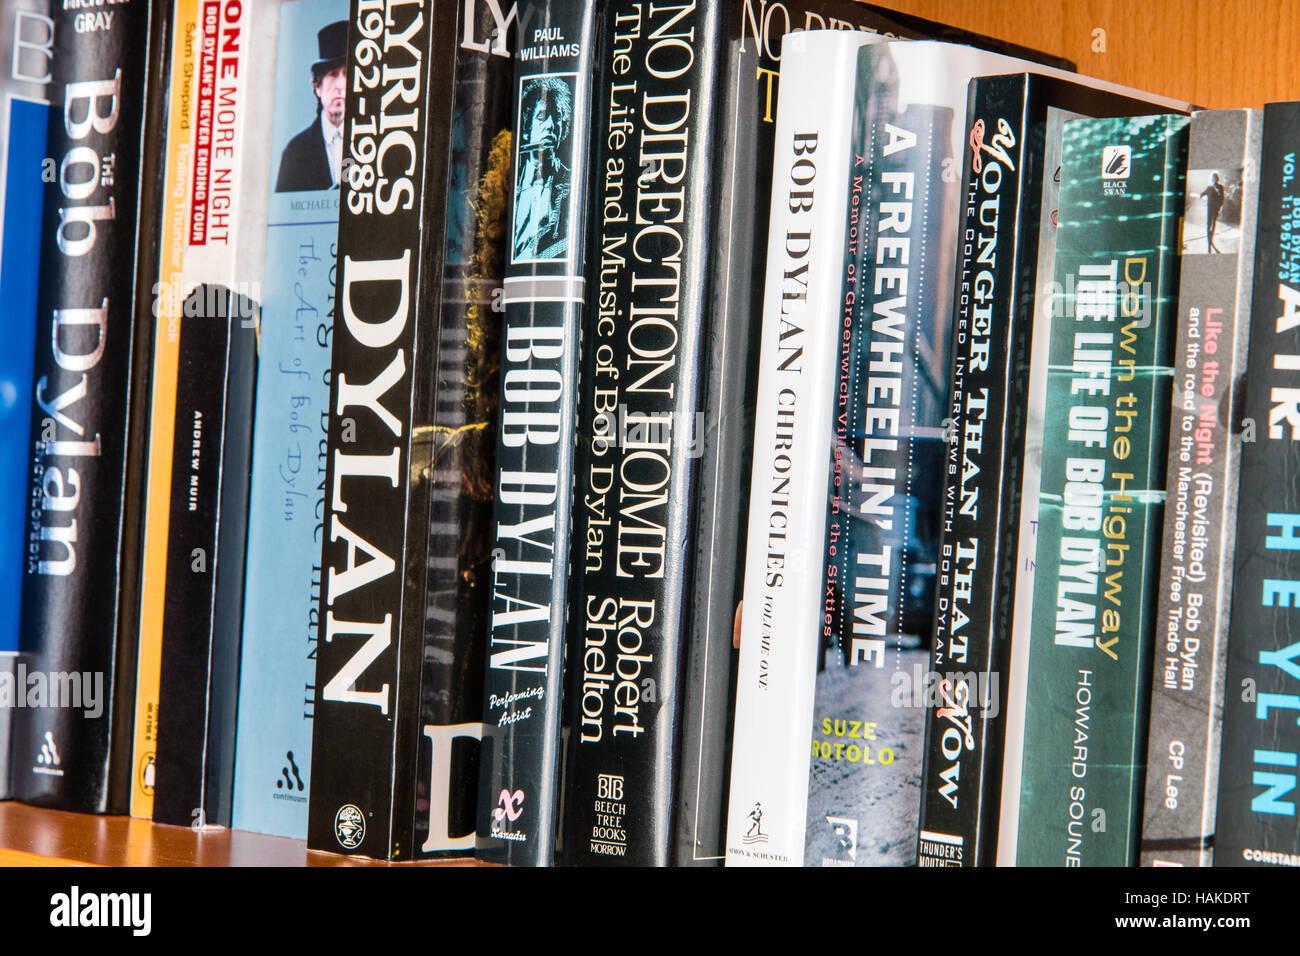 Book shelve with books on Bob Dylan the American folk, rock singer. Paperbacks and hardbacks. - Stock Image